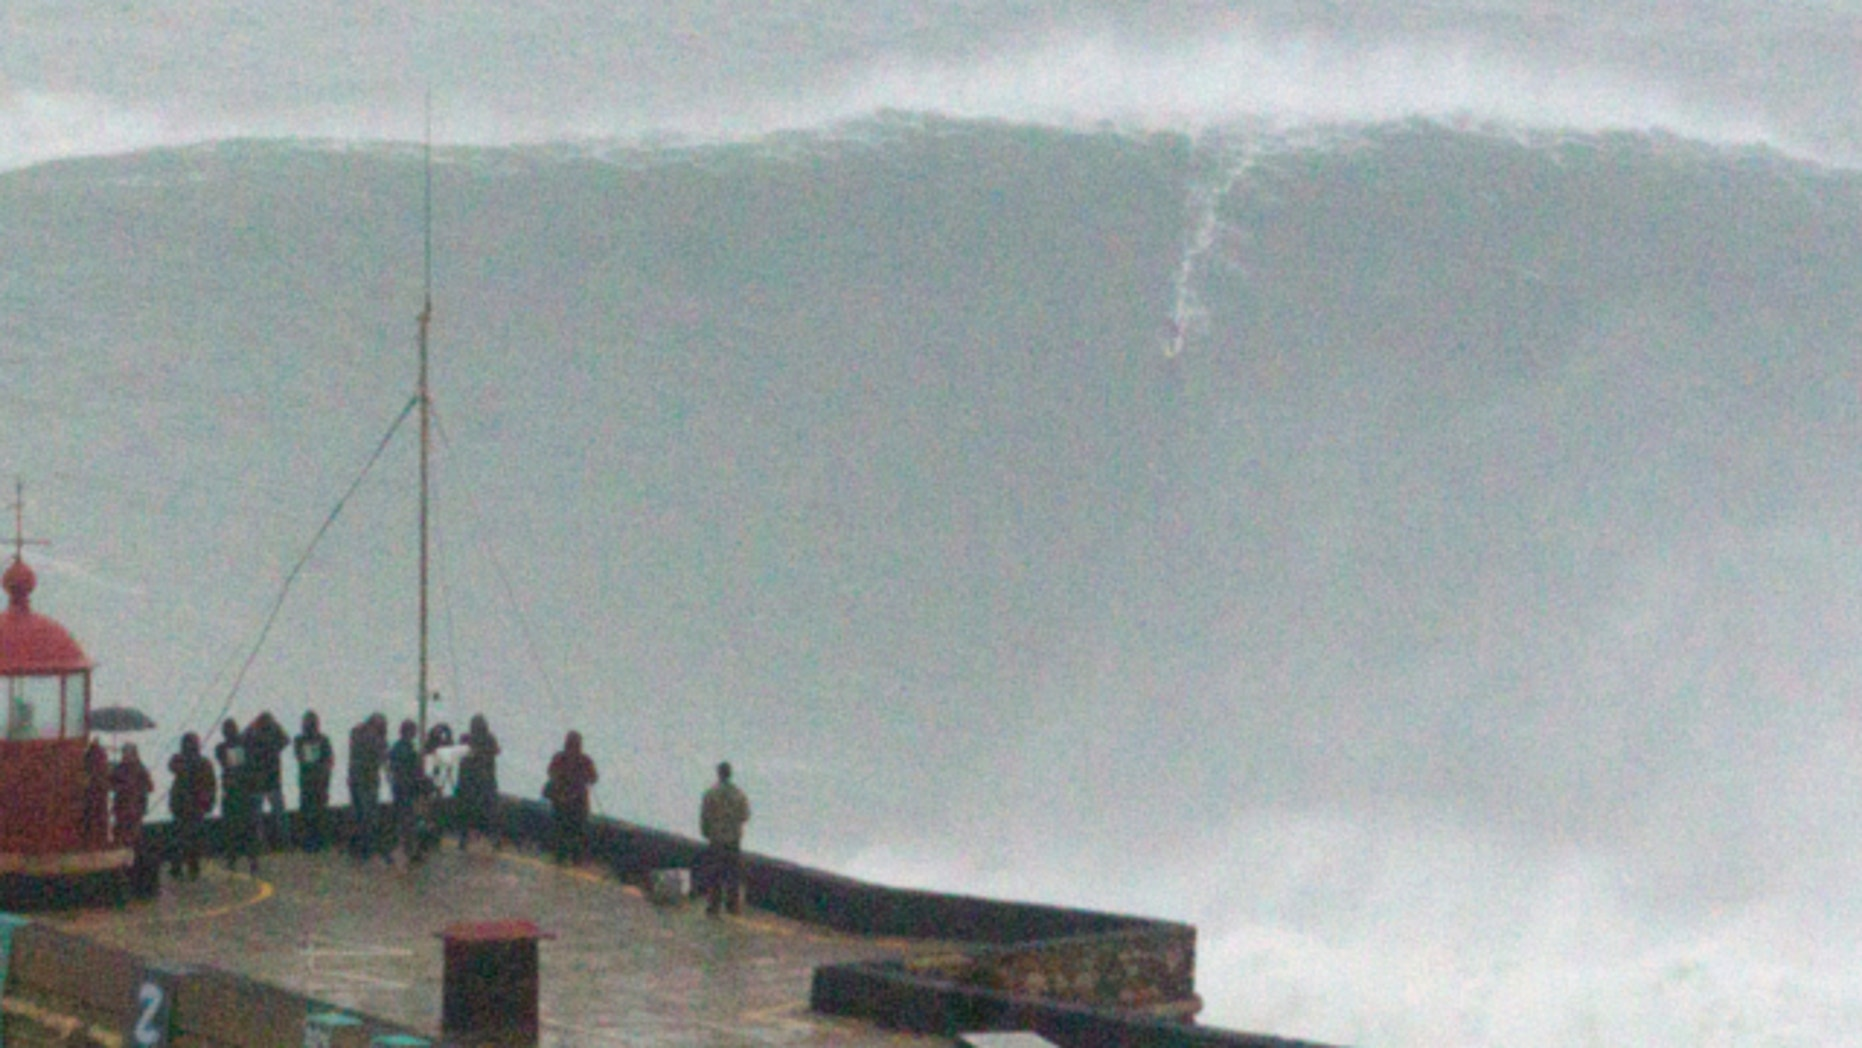 Oct. 28 2013: Brazilian surfer Carlos Burle rides a big wave at the Praia do Norte, north beach, at the fishing village of Nazare in Portugal's Atlantic coast.